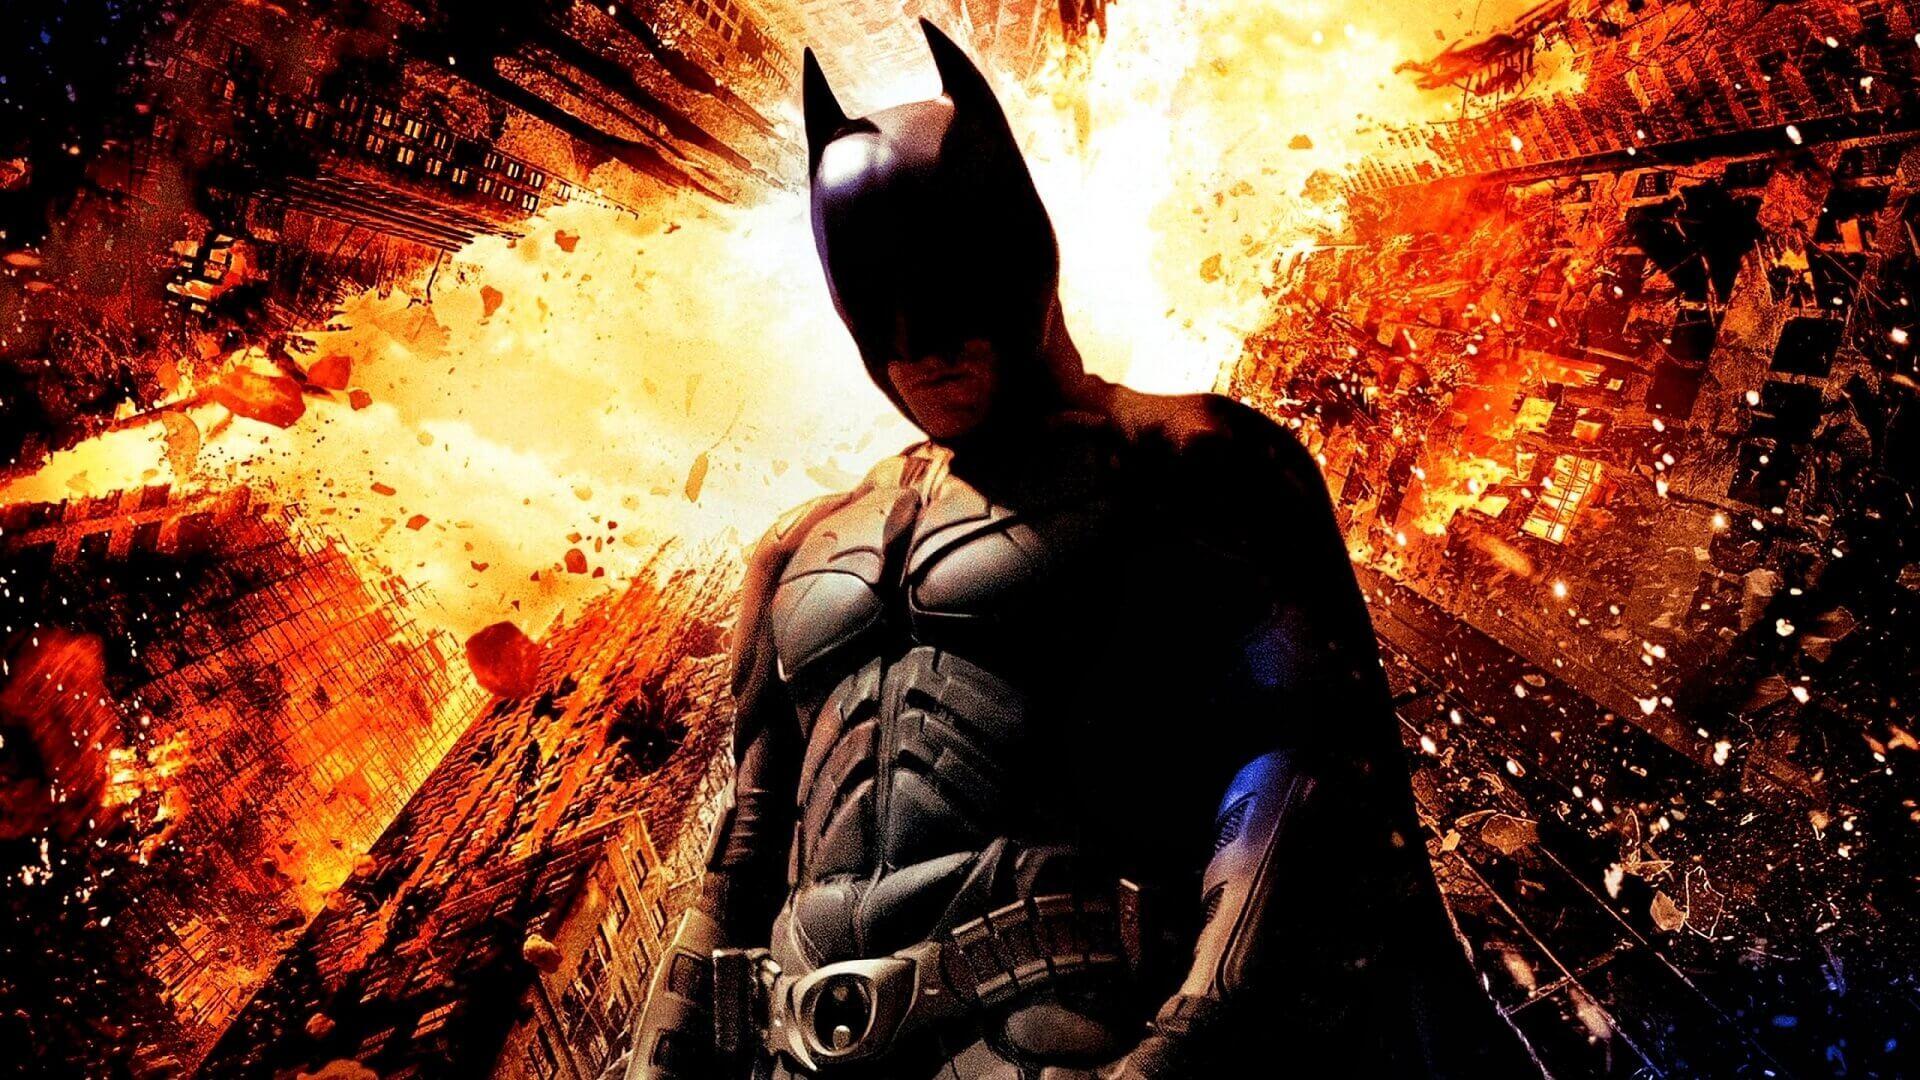 The Dark Knight Rises Script Teardown - Featured Image